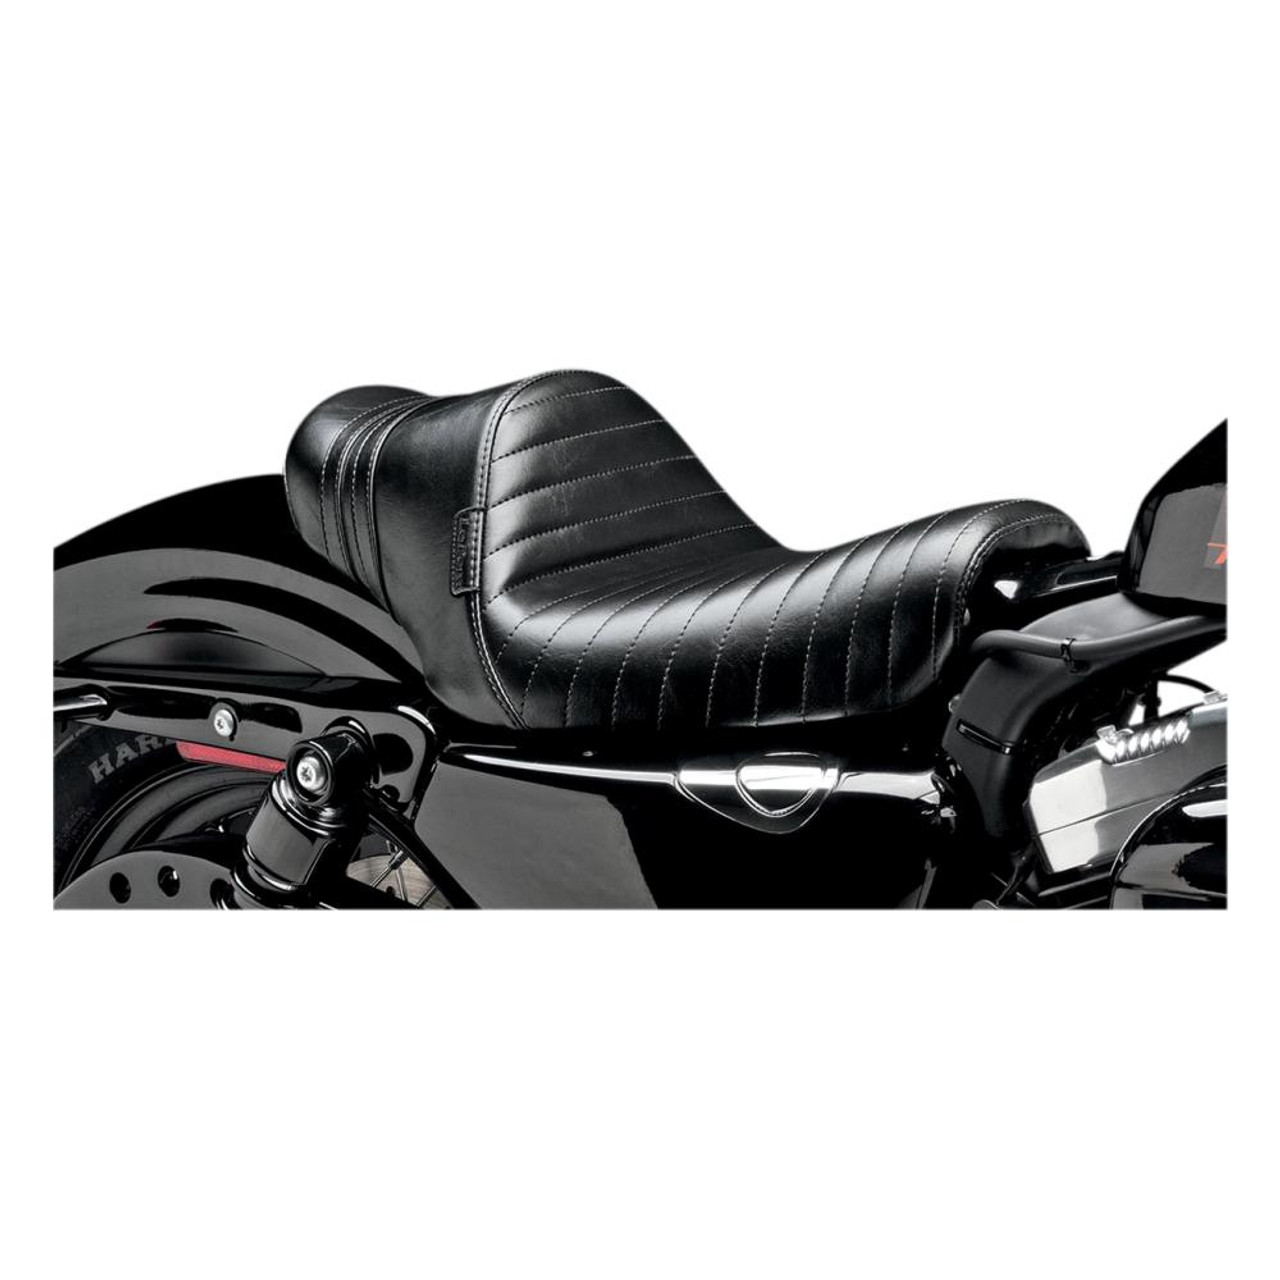 Le Pera Stubs Spoiler Seat Sportster Black/Black 2004-2017 Throttle Addiction